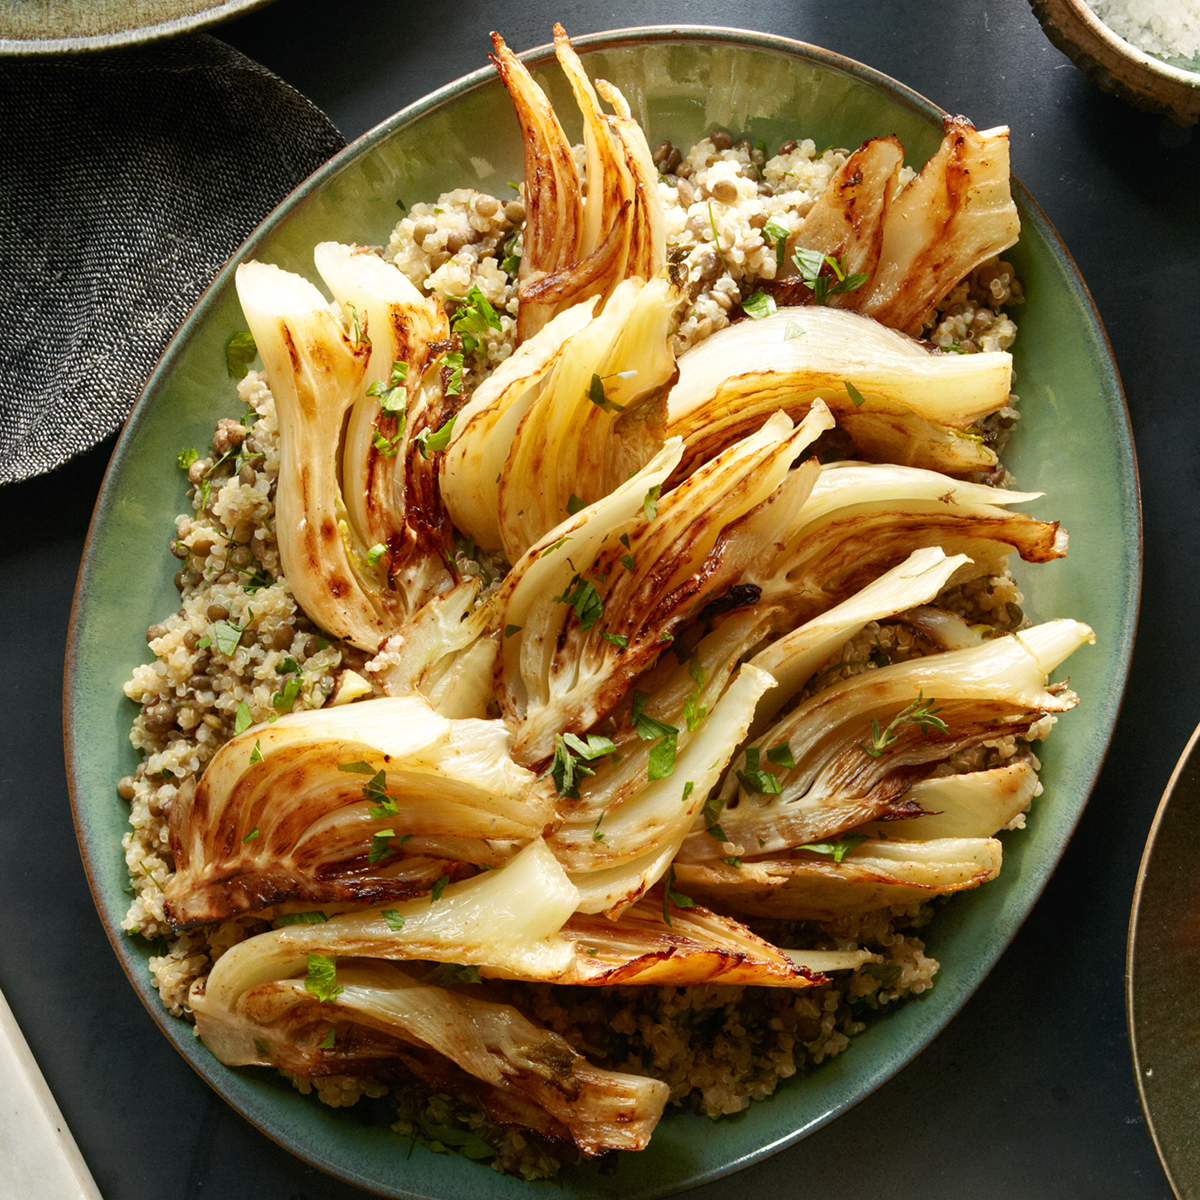 braised fennel with lentil quinoa pilaf